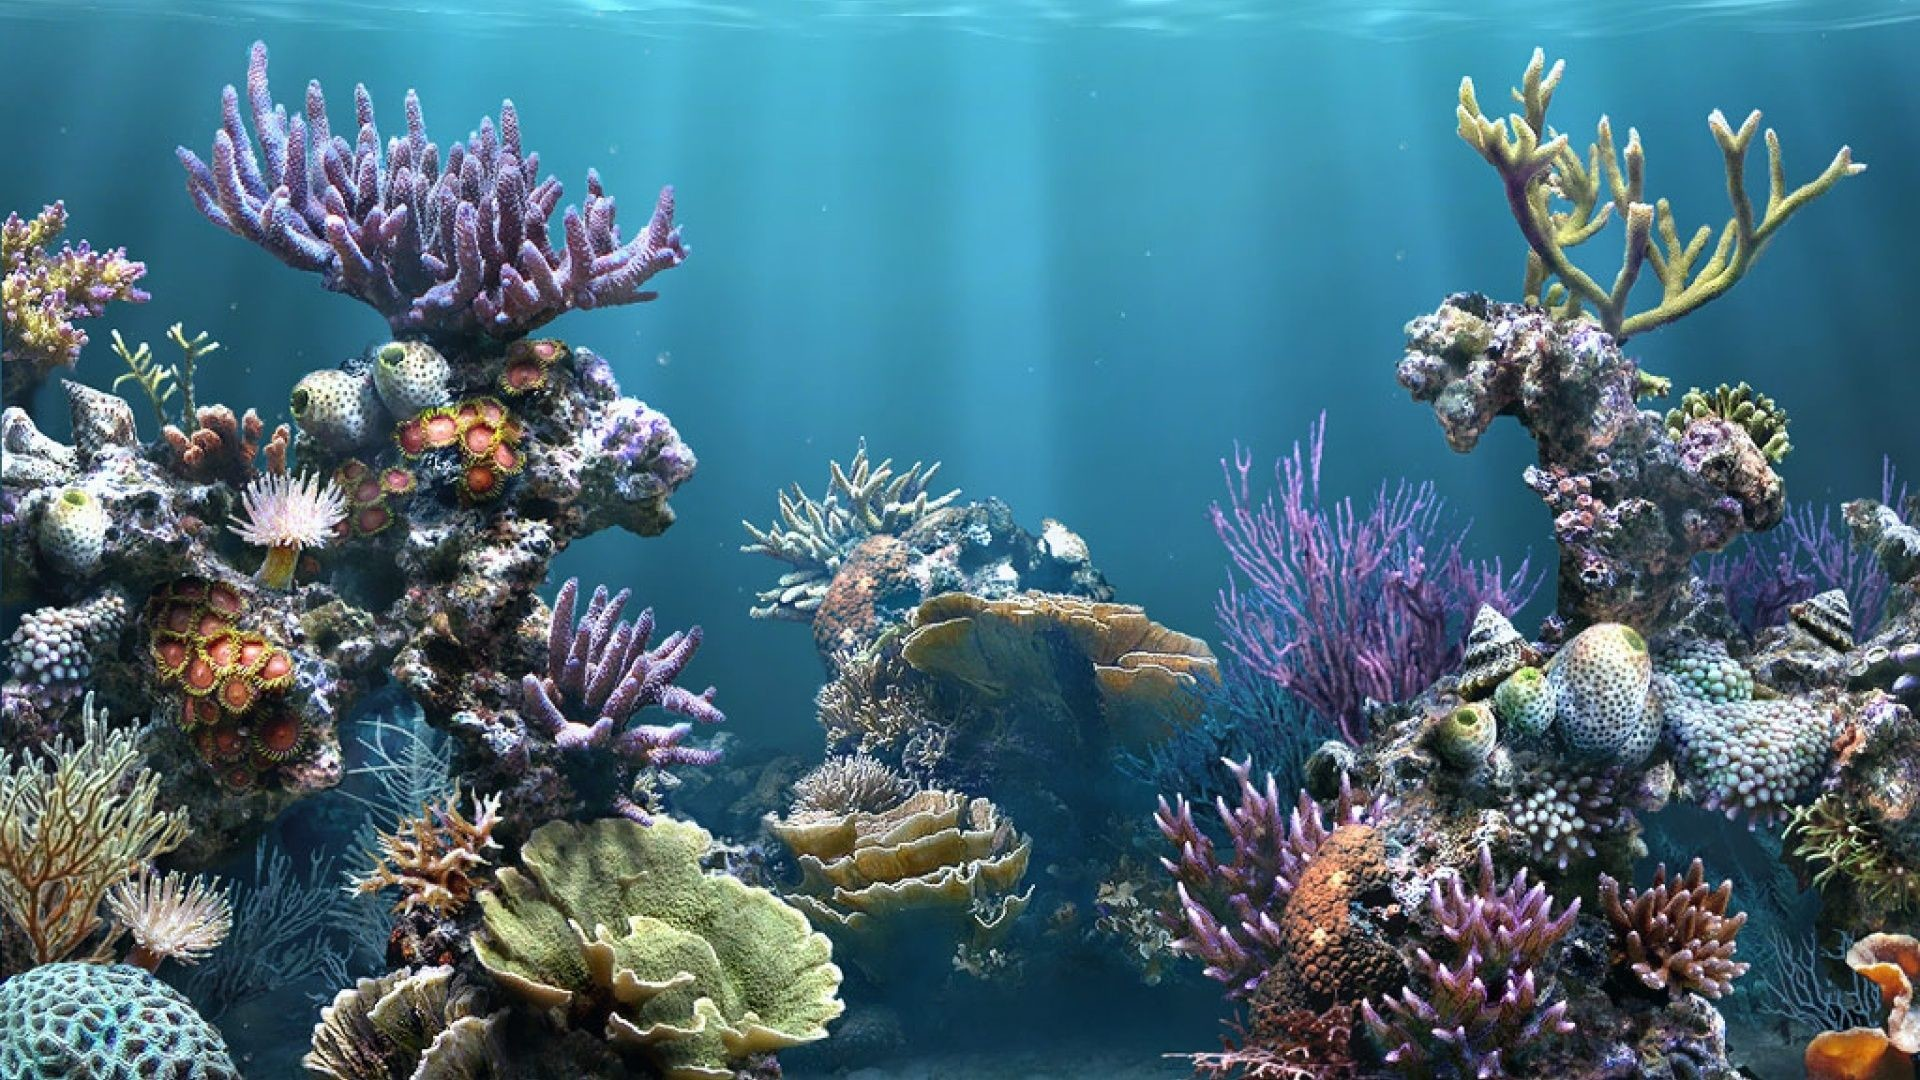 Fish Aquarium Wallpaper For Mobile : Fish tank backgrounds download u2013  wallpapercraft